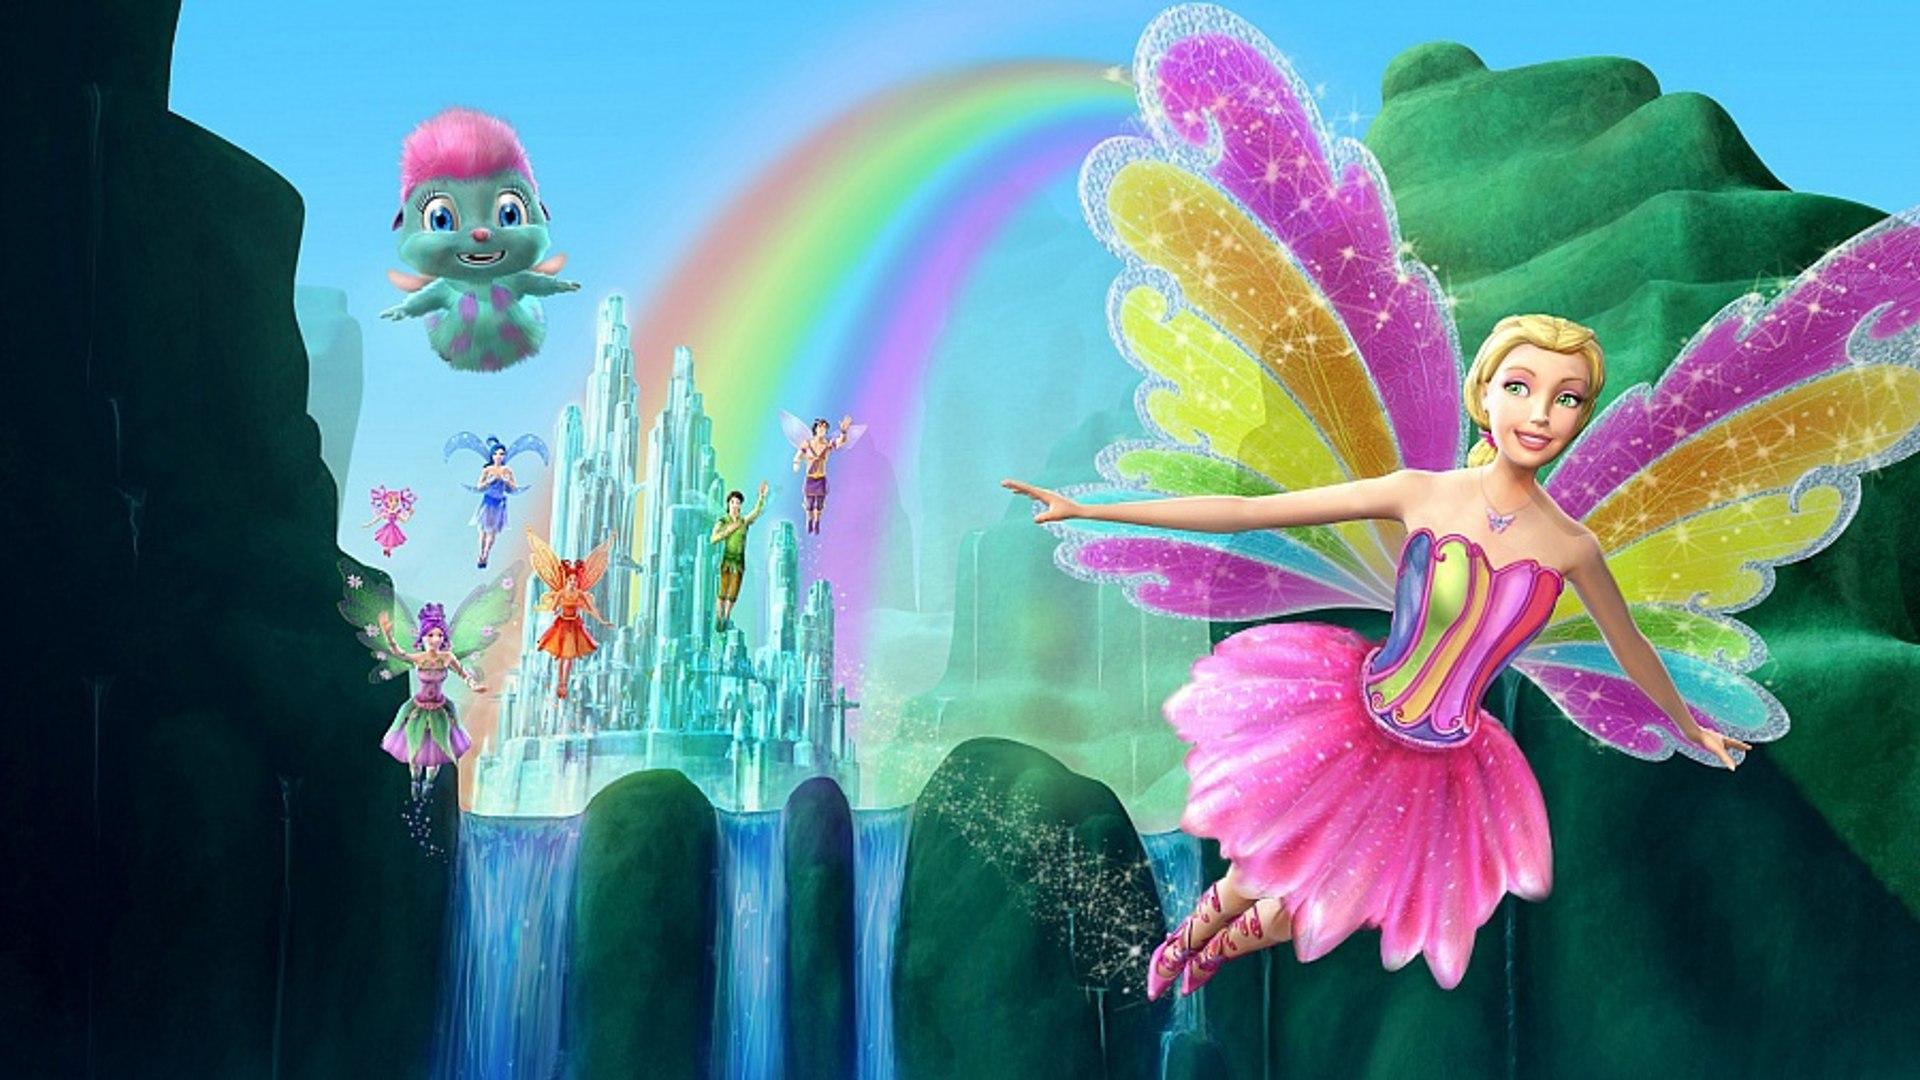 Barbie Magic of the Rainbow Movie Poster 22x28   Barbie fairytopia ...   1080x1920